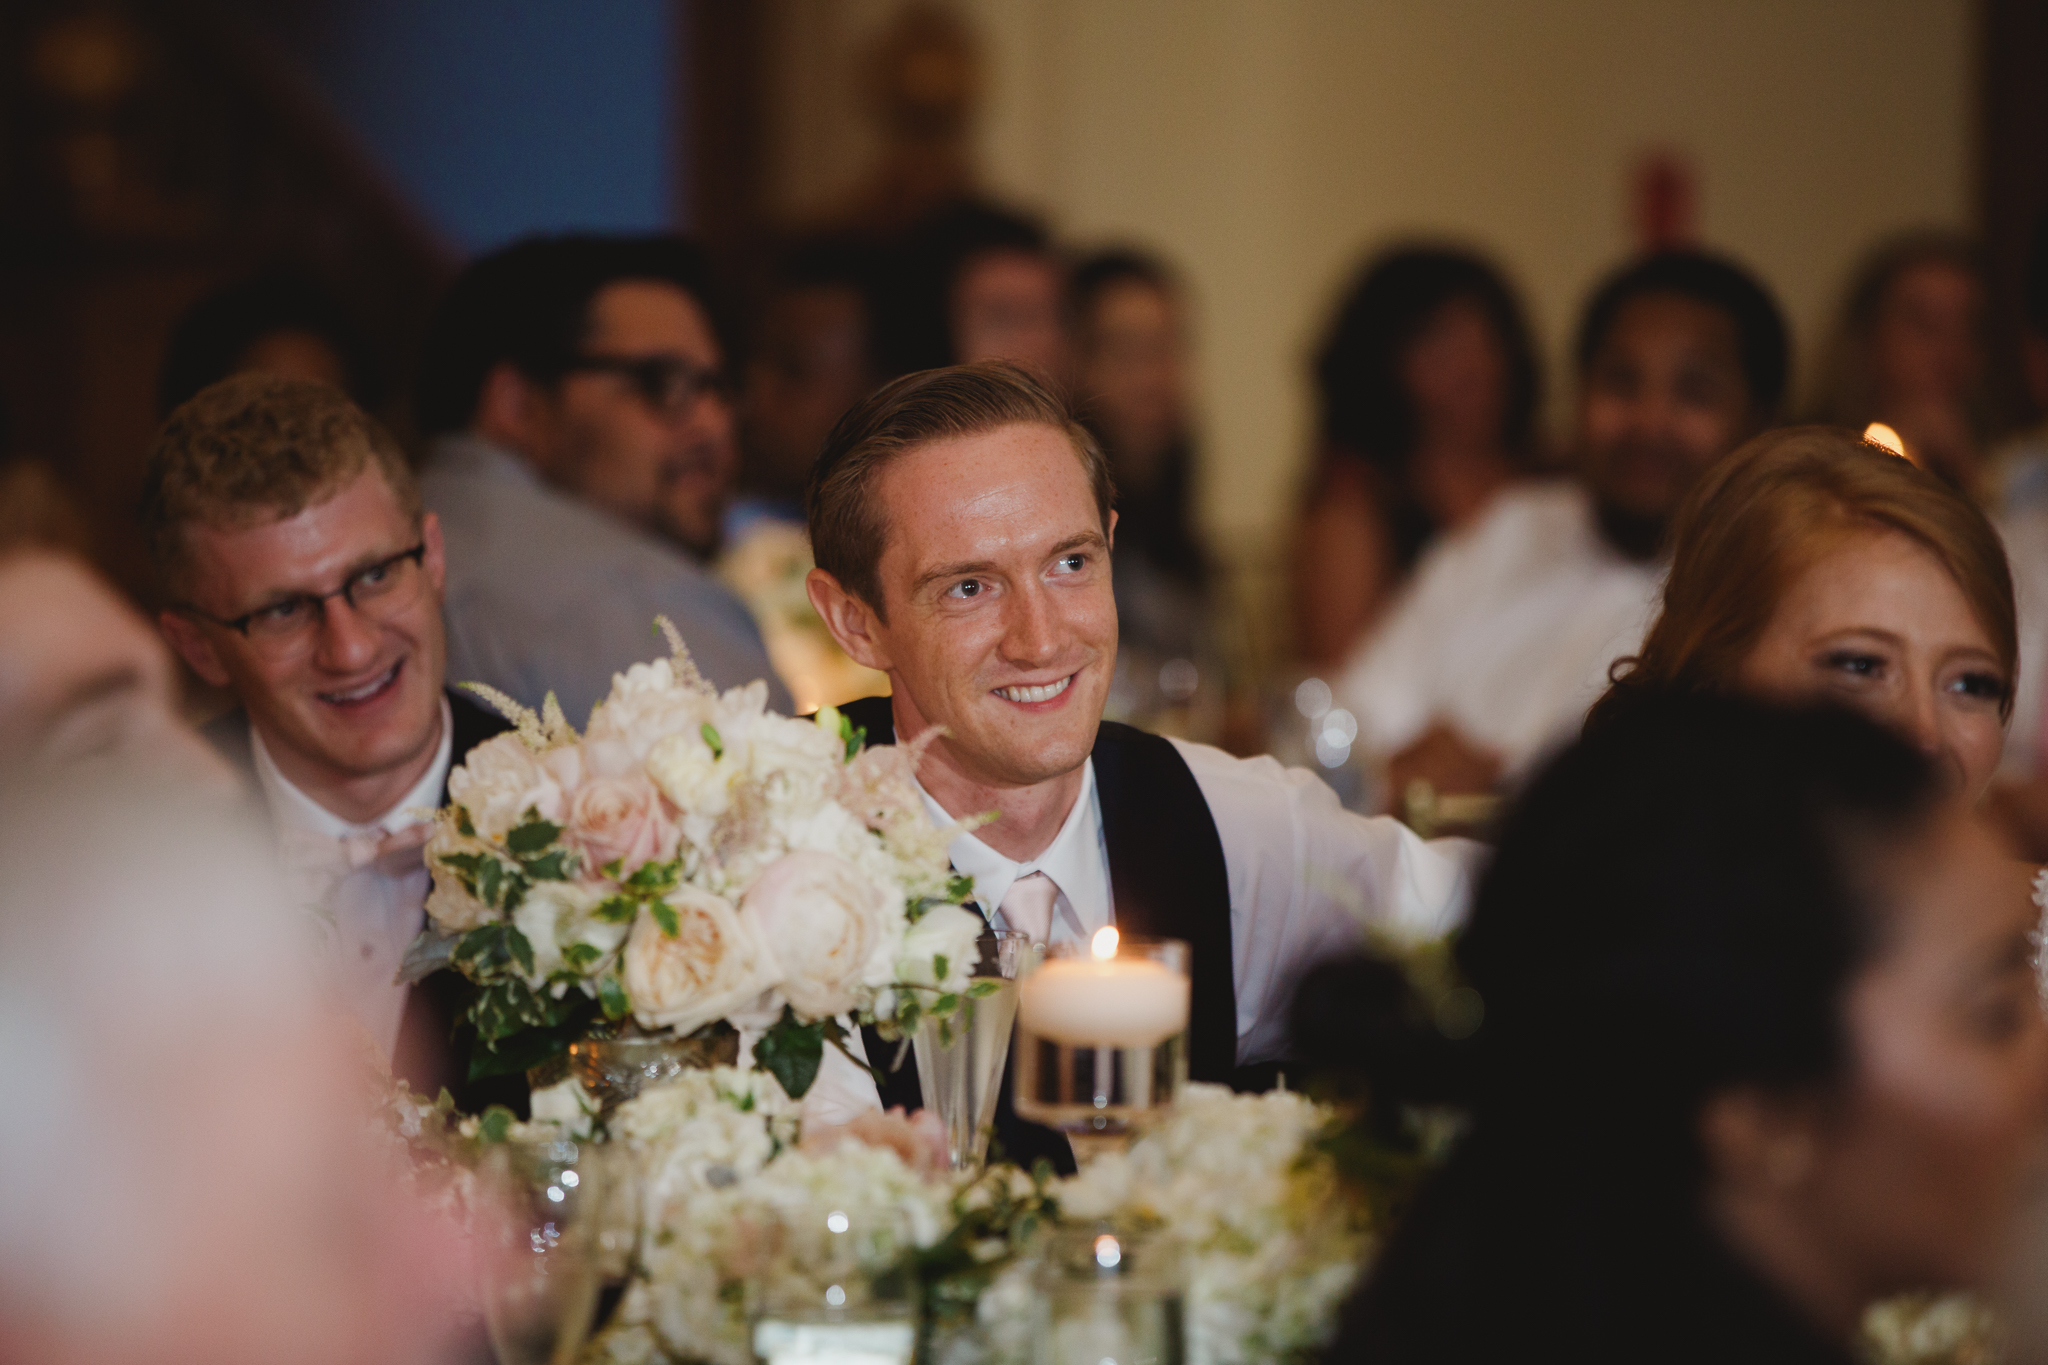 Michael and Kelly - the ashton depot - wedding DFW - wedding photographer- elizalde photography (101 of 150).jpg